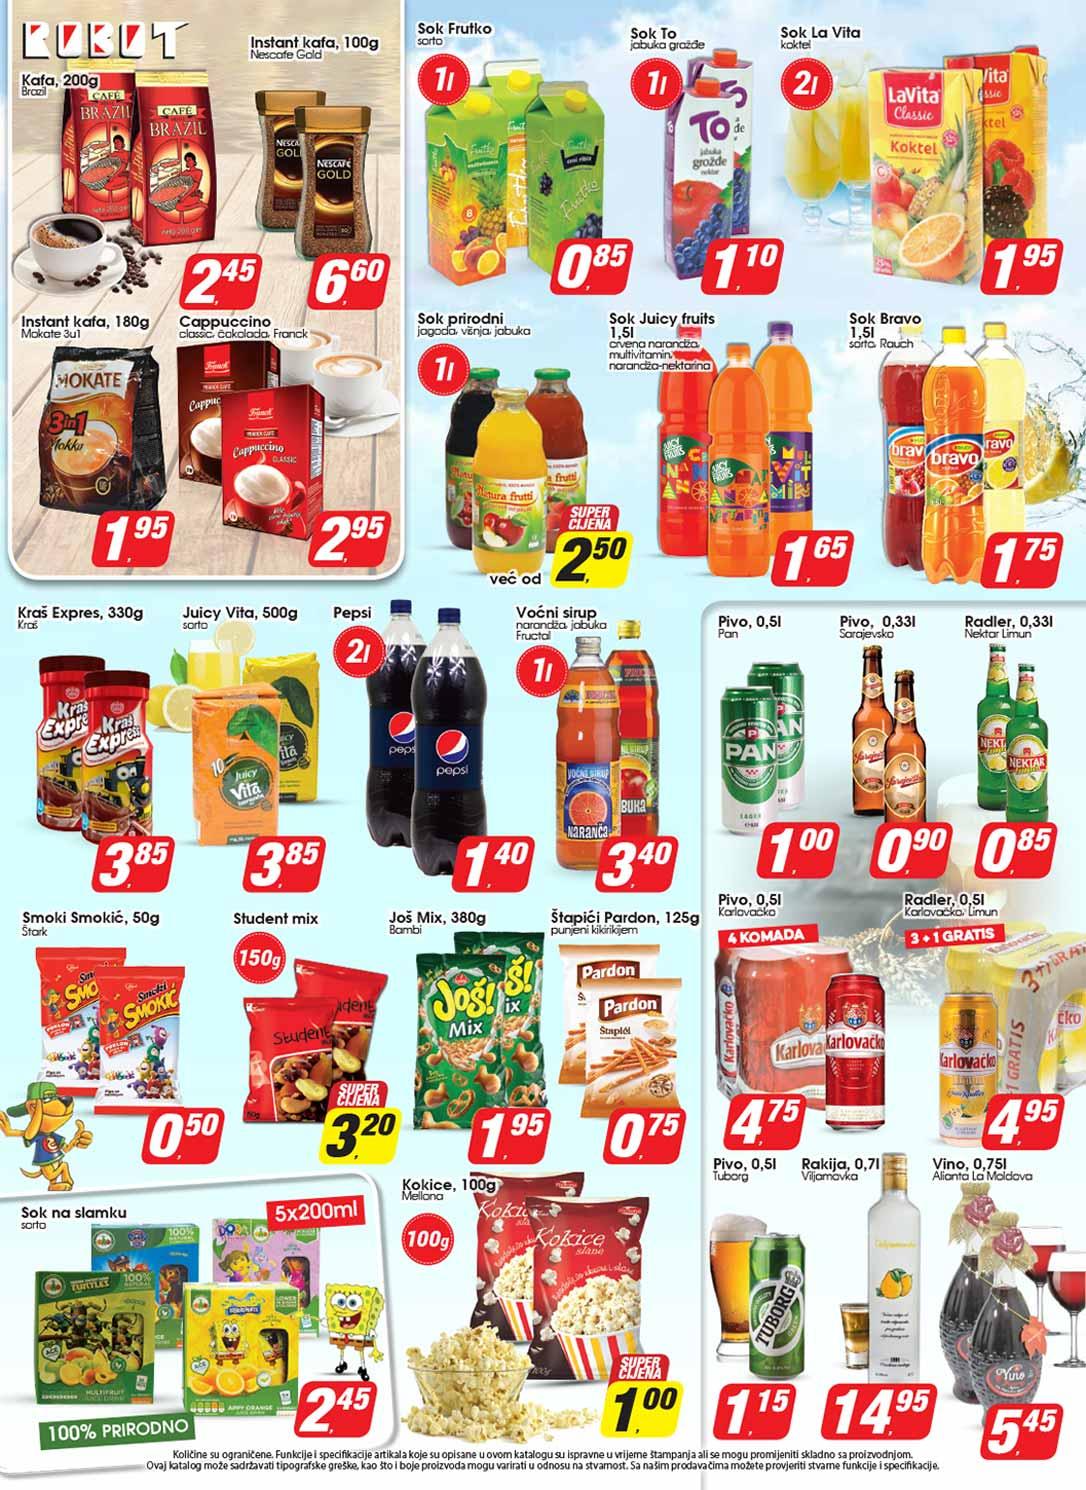 Robot katalog prehrana - 31.08.2017.